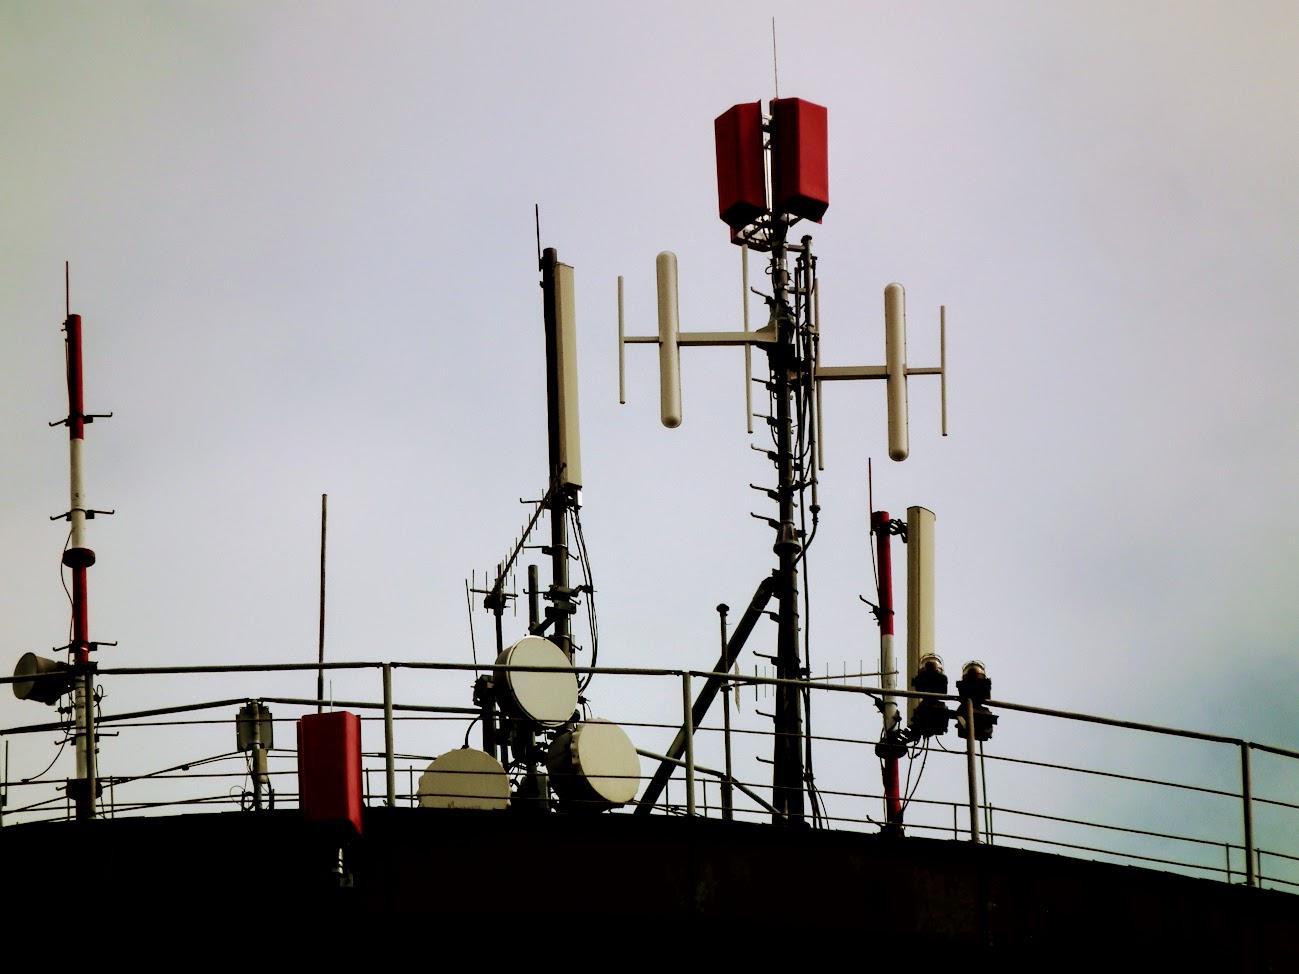 Dunaújváros/víztorony, Martinovics utca - DVB-T gapfiller